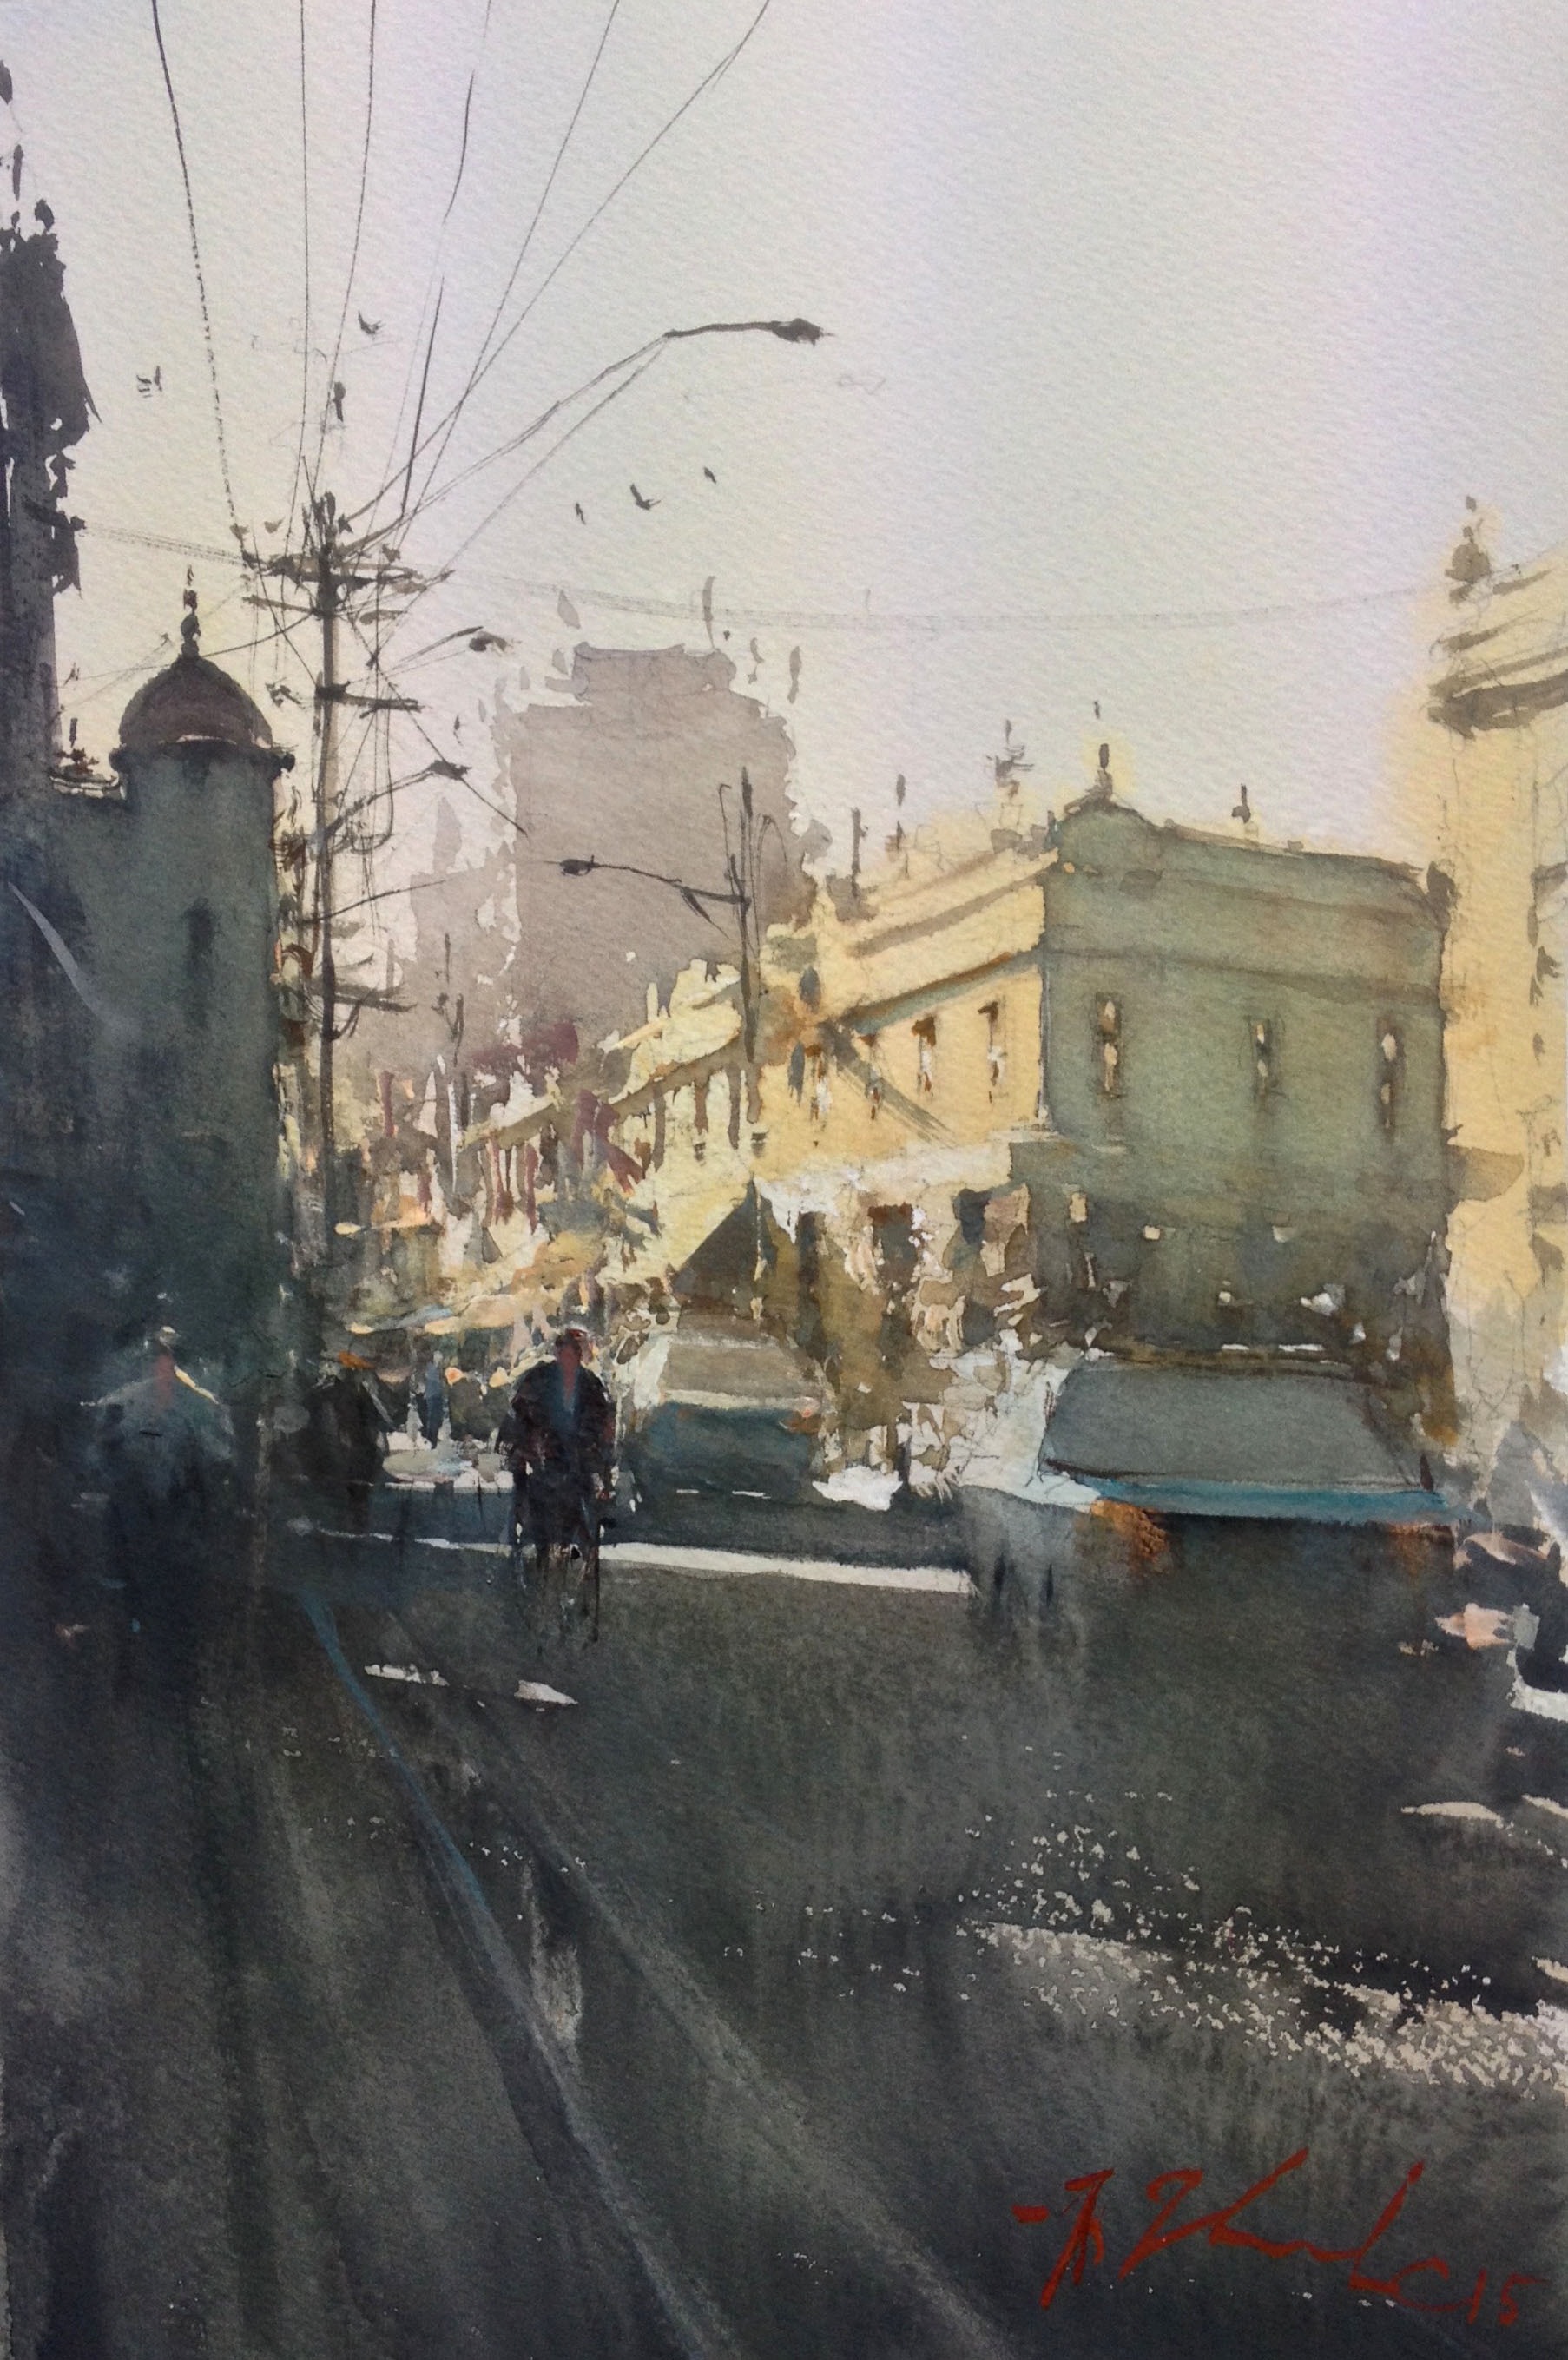 Joseph Zbukvic, Cnr Johnstone and Brunswick   Watercolour, framed, available